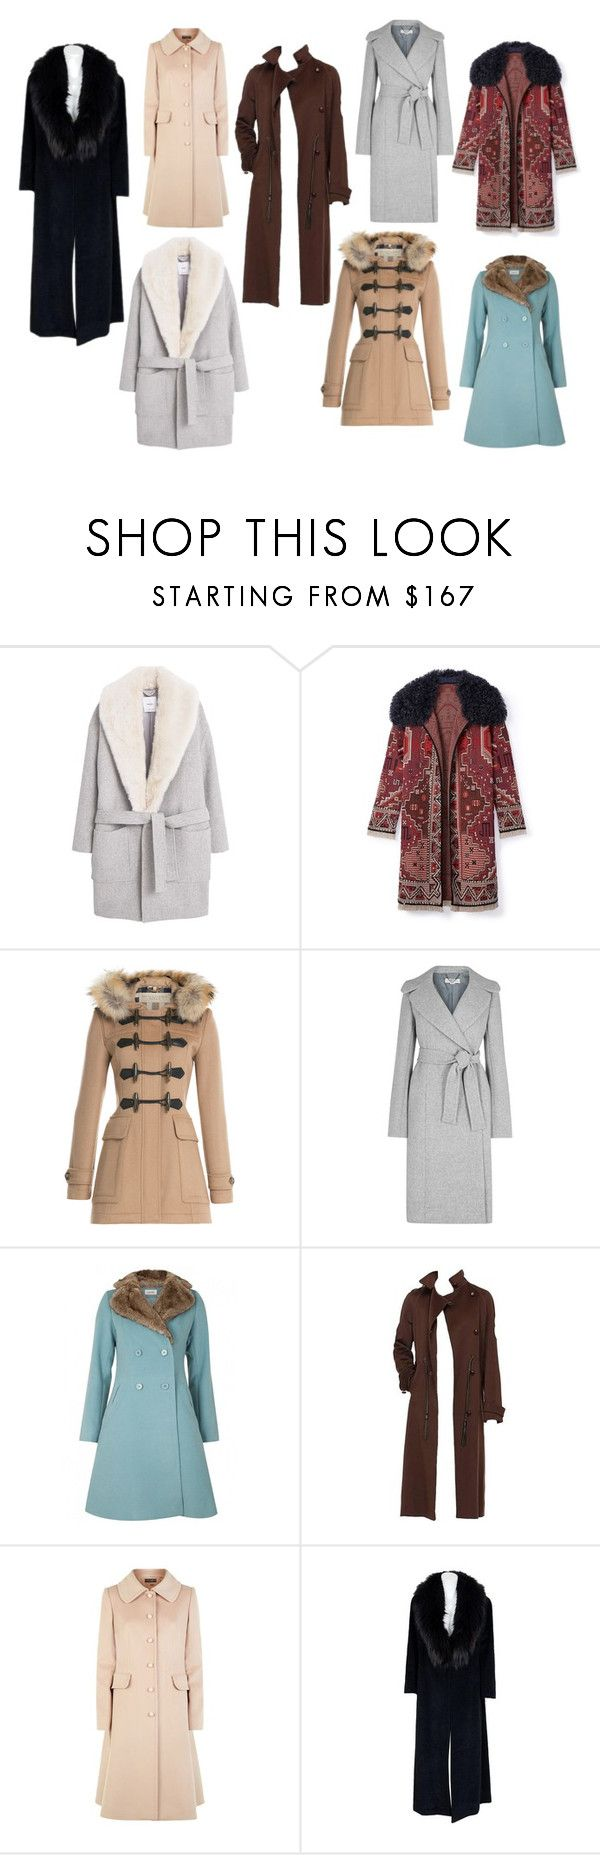 пальто 15-16 by tatyana-yurasova on Polyvore featuring мода, Sorelle Fontana, MANGO, Burberry, Yves Saint Laurent, Tory Burch, Louche, STELLA McCARTNEY and Dolce&Gabbana